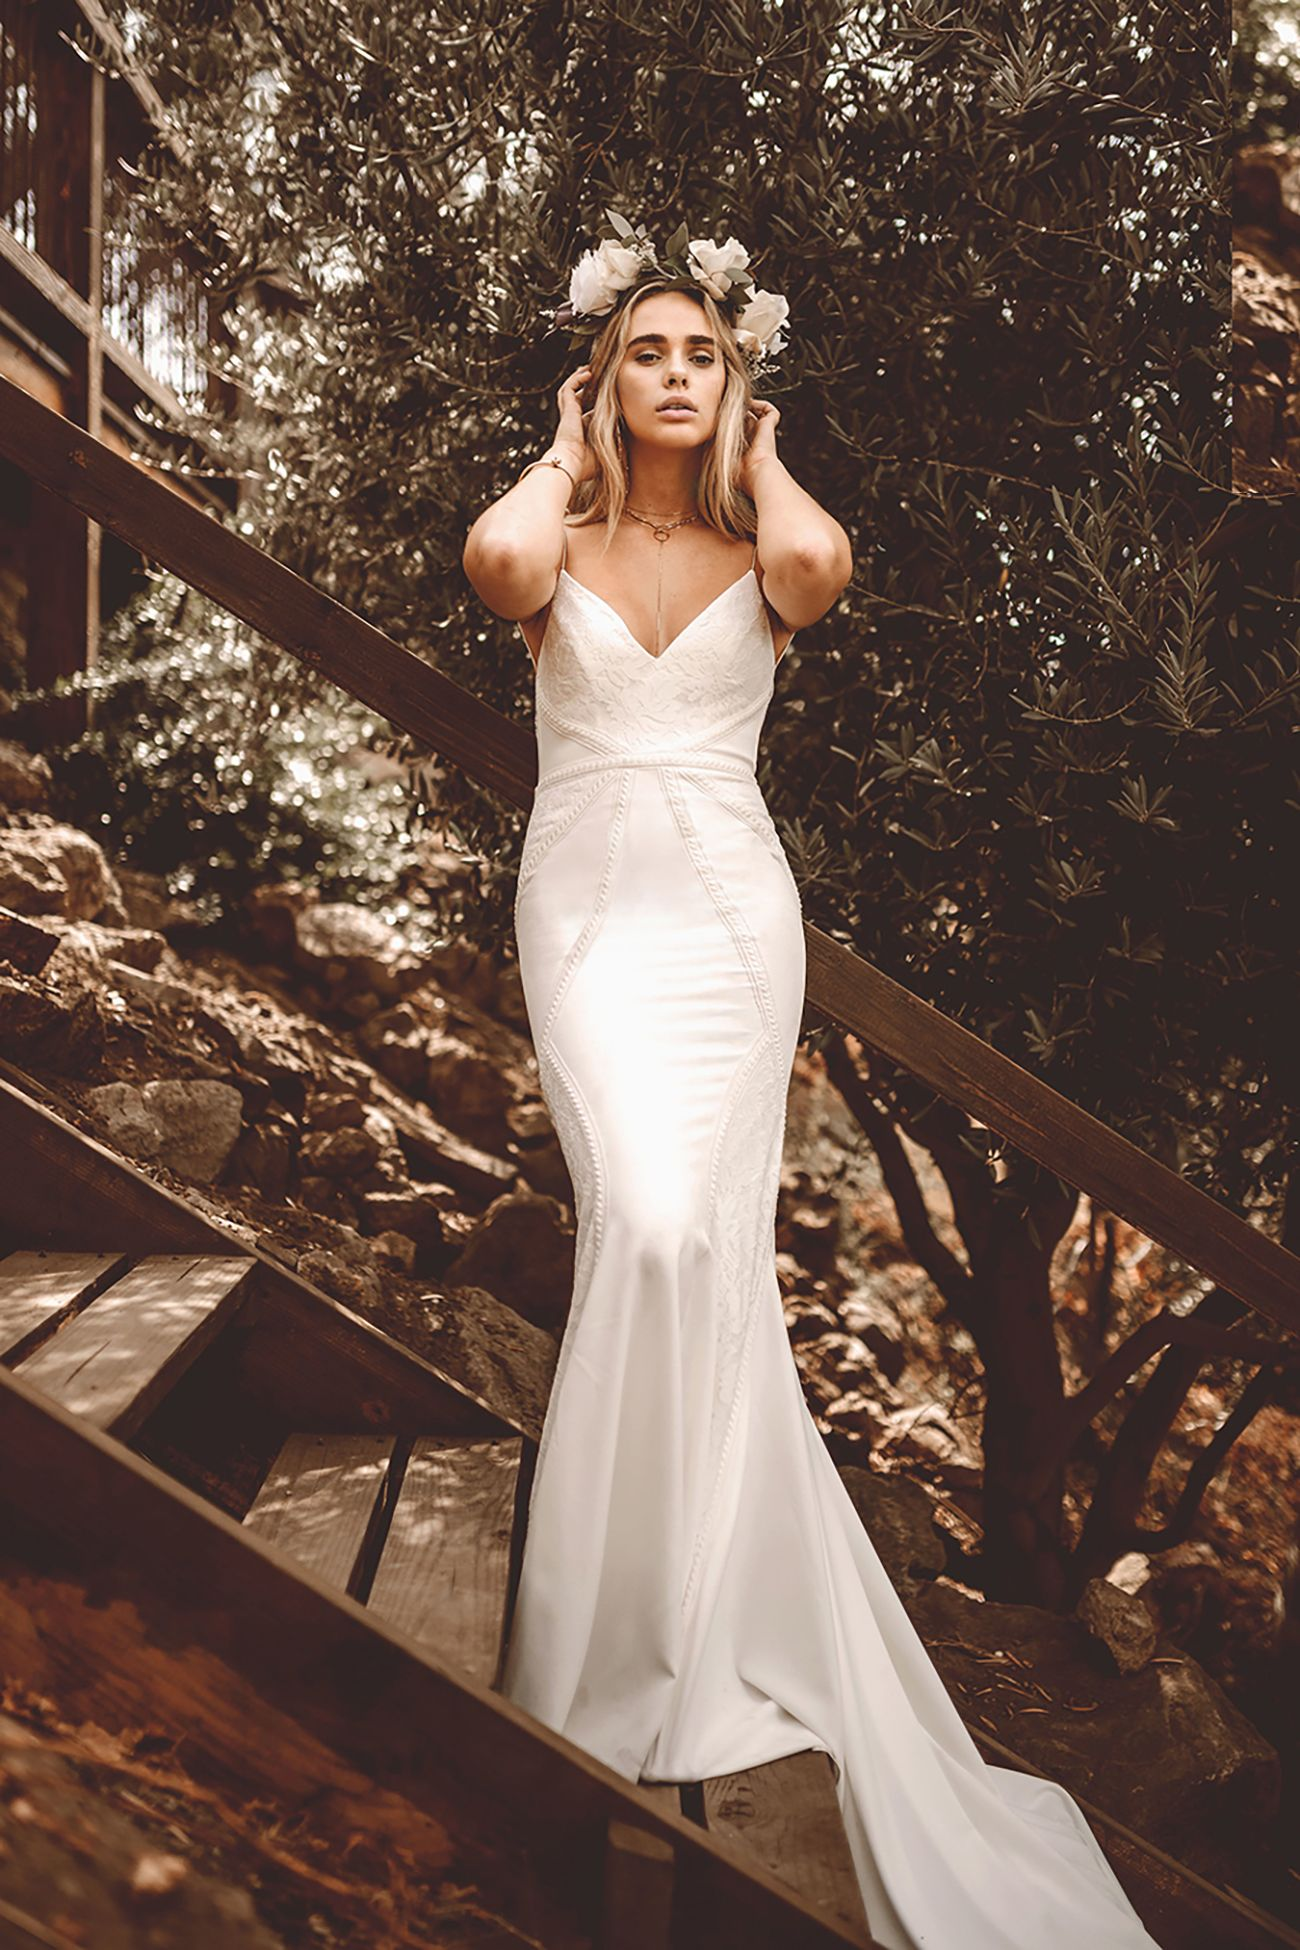 Wedding beach dress  Surf  Sand  Wedding Dresses for Your LaidBack Beach Wedding